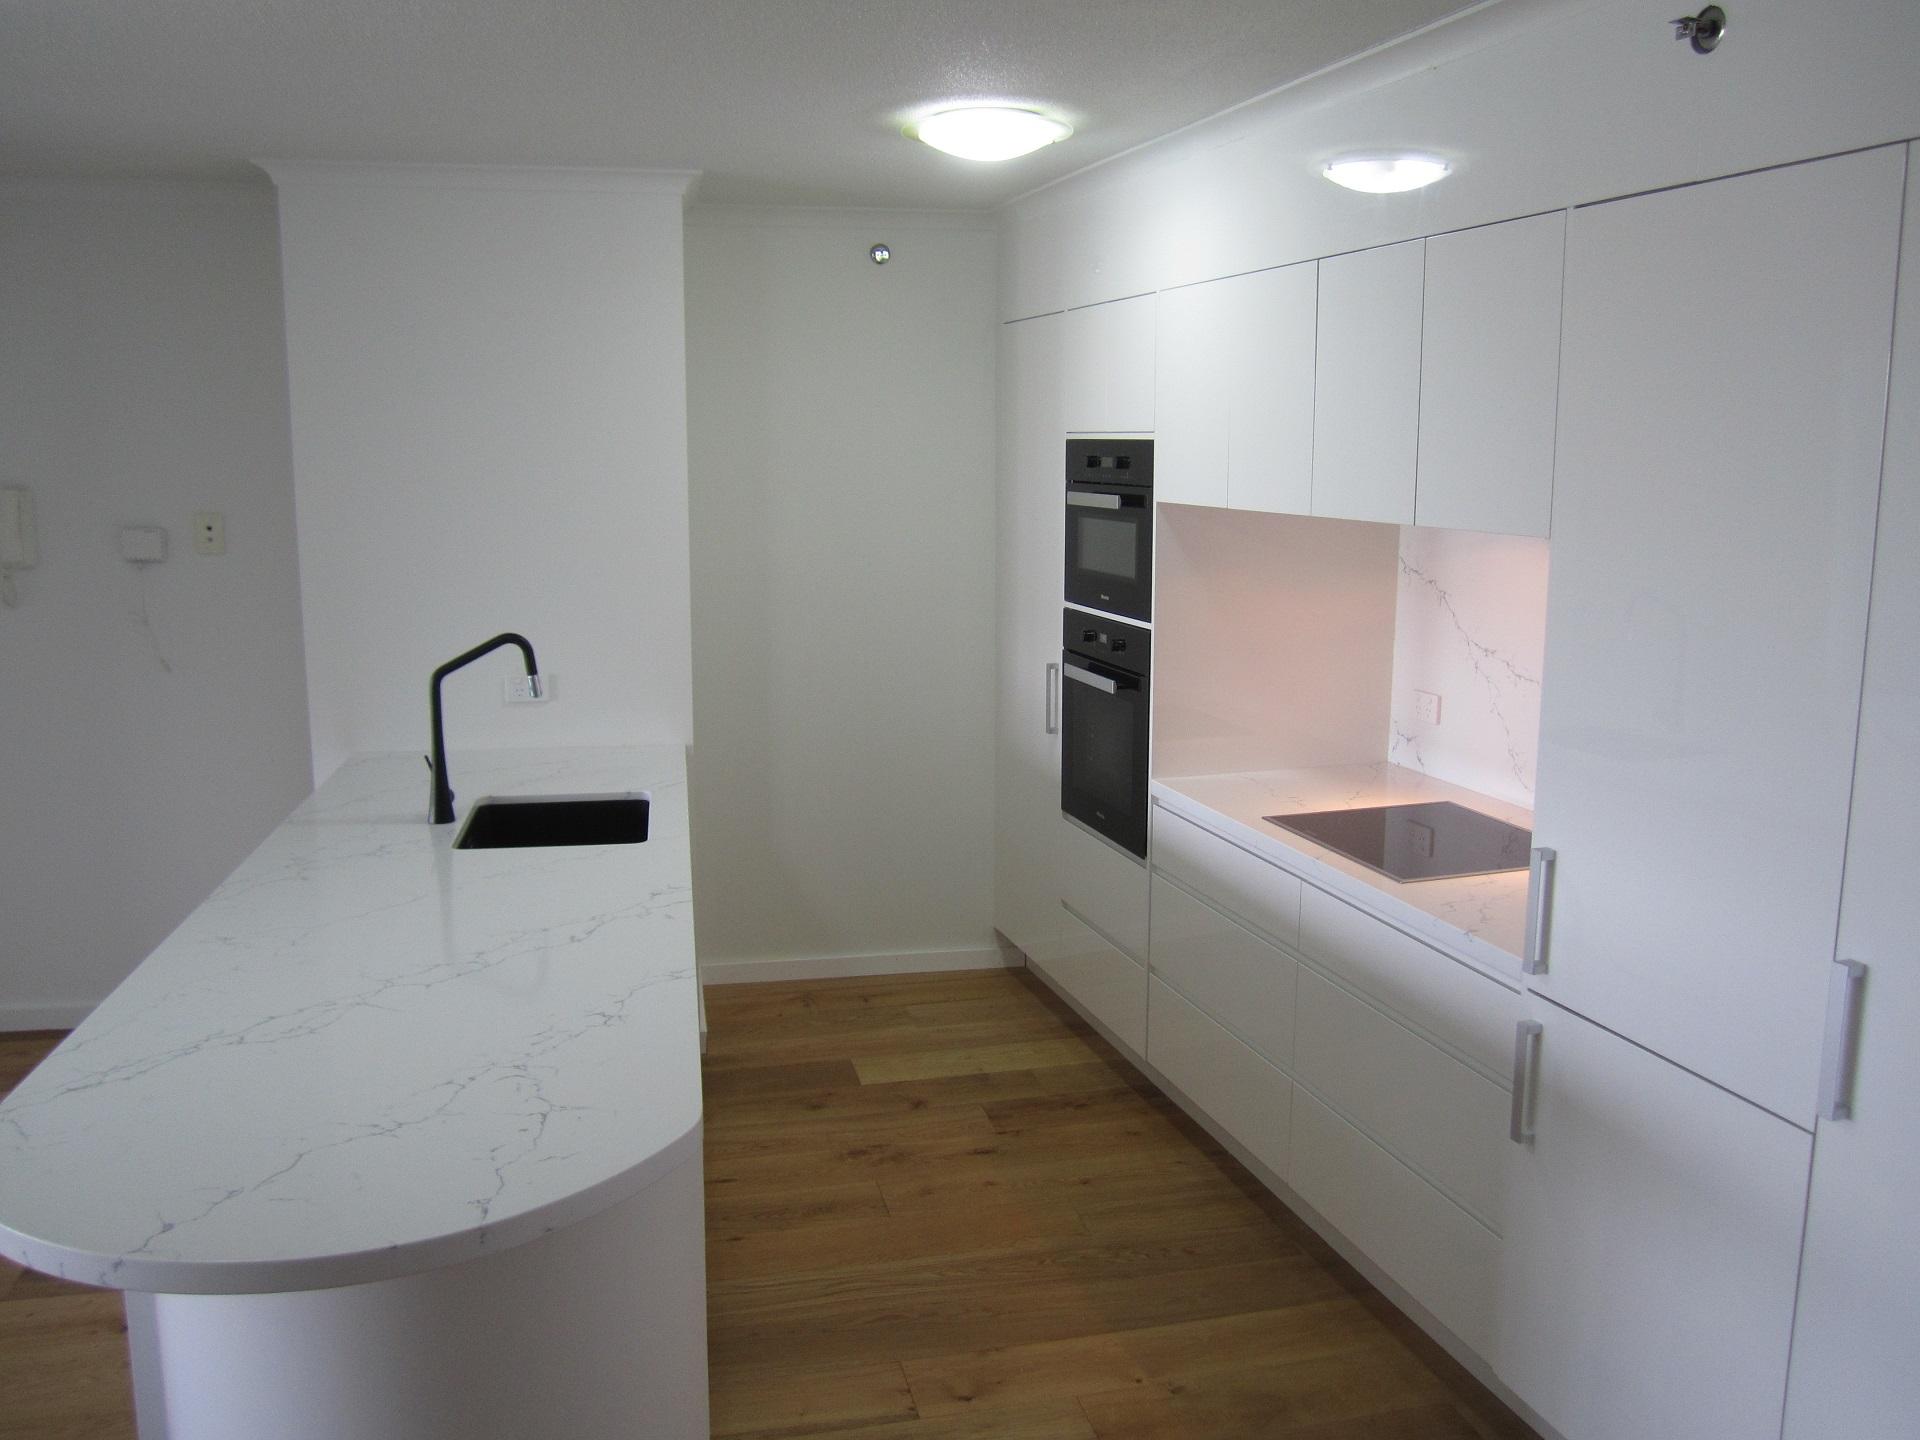 Brisbane Kitchen Design Brisbane City Contemporary Kitchen Renovation White 2 Pac Statuario Benchtop (5)